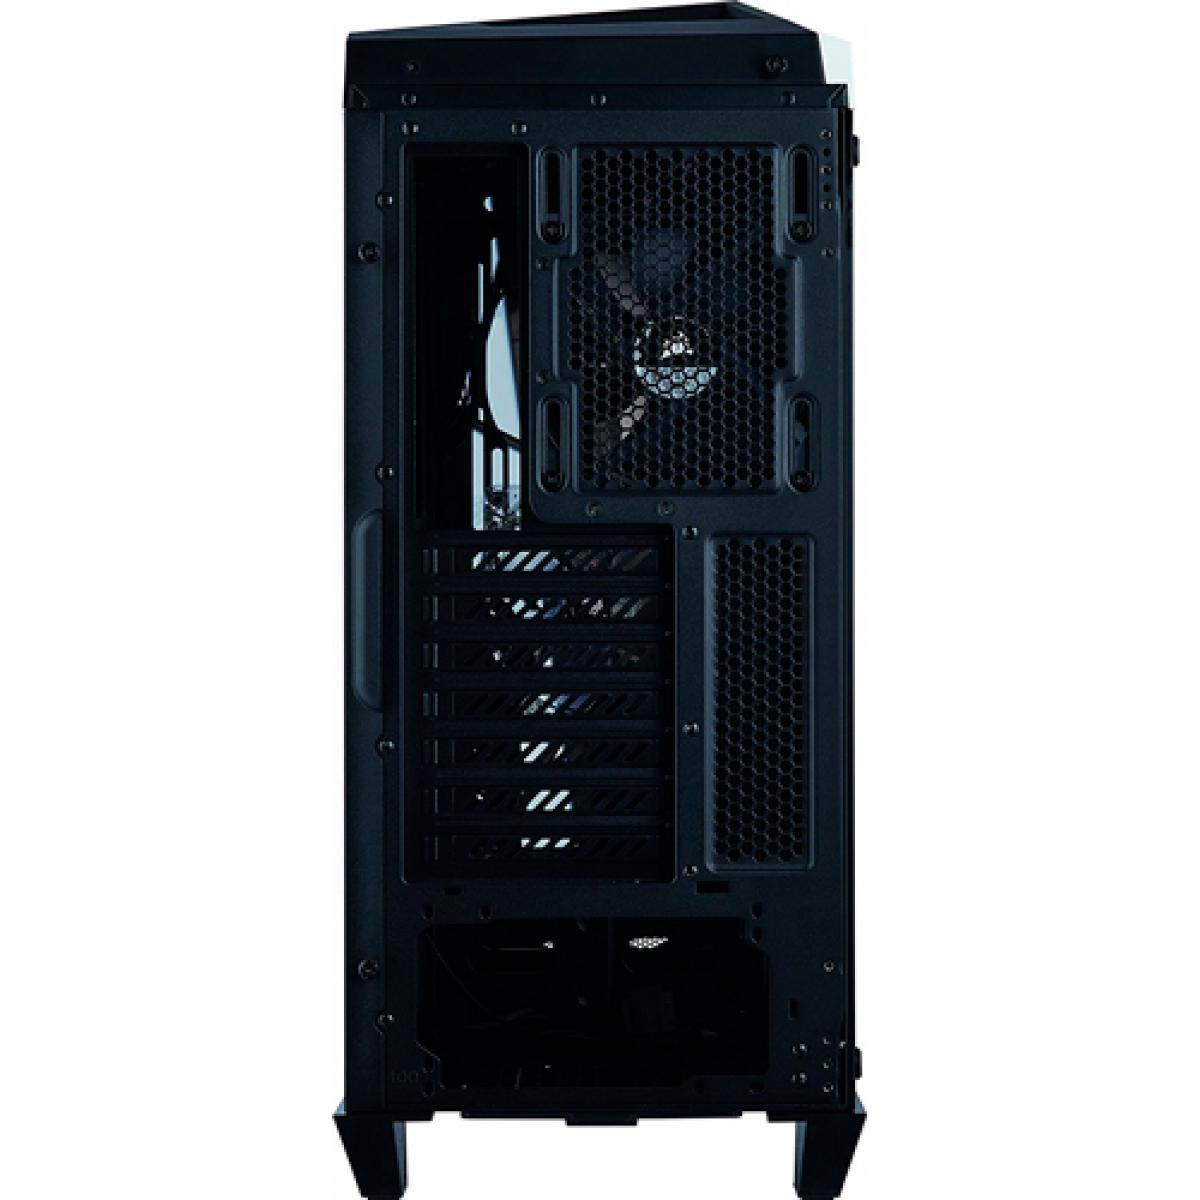 Gabinete Gamer Corsair Carbide Spec-Omega, Mid Tower, Com 2 Fans, Vidro Temperado, Black-White, S-Fonte, CC-9011119-WW